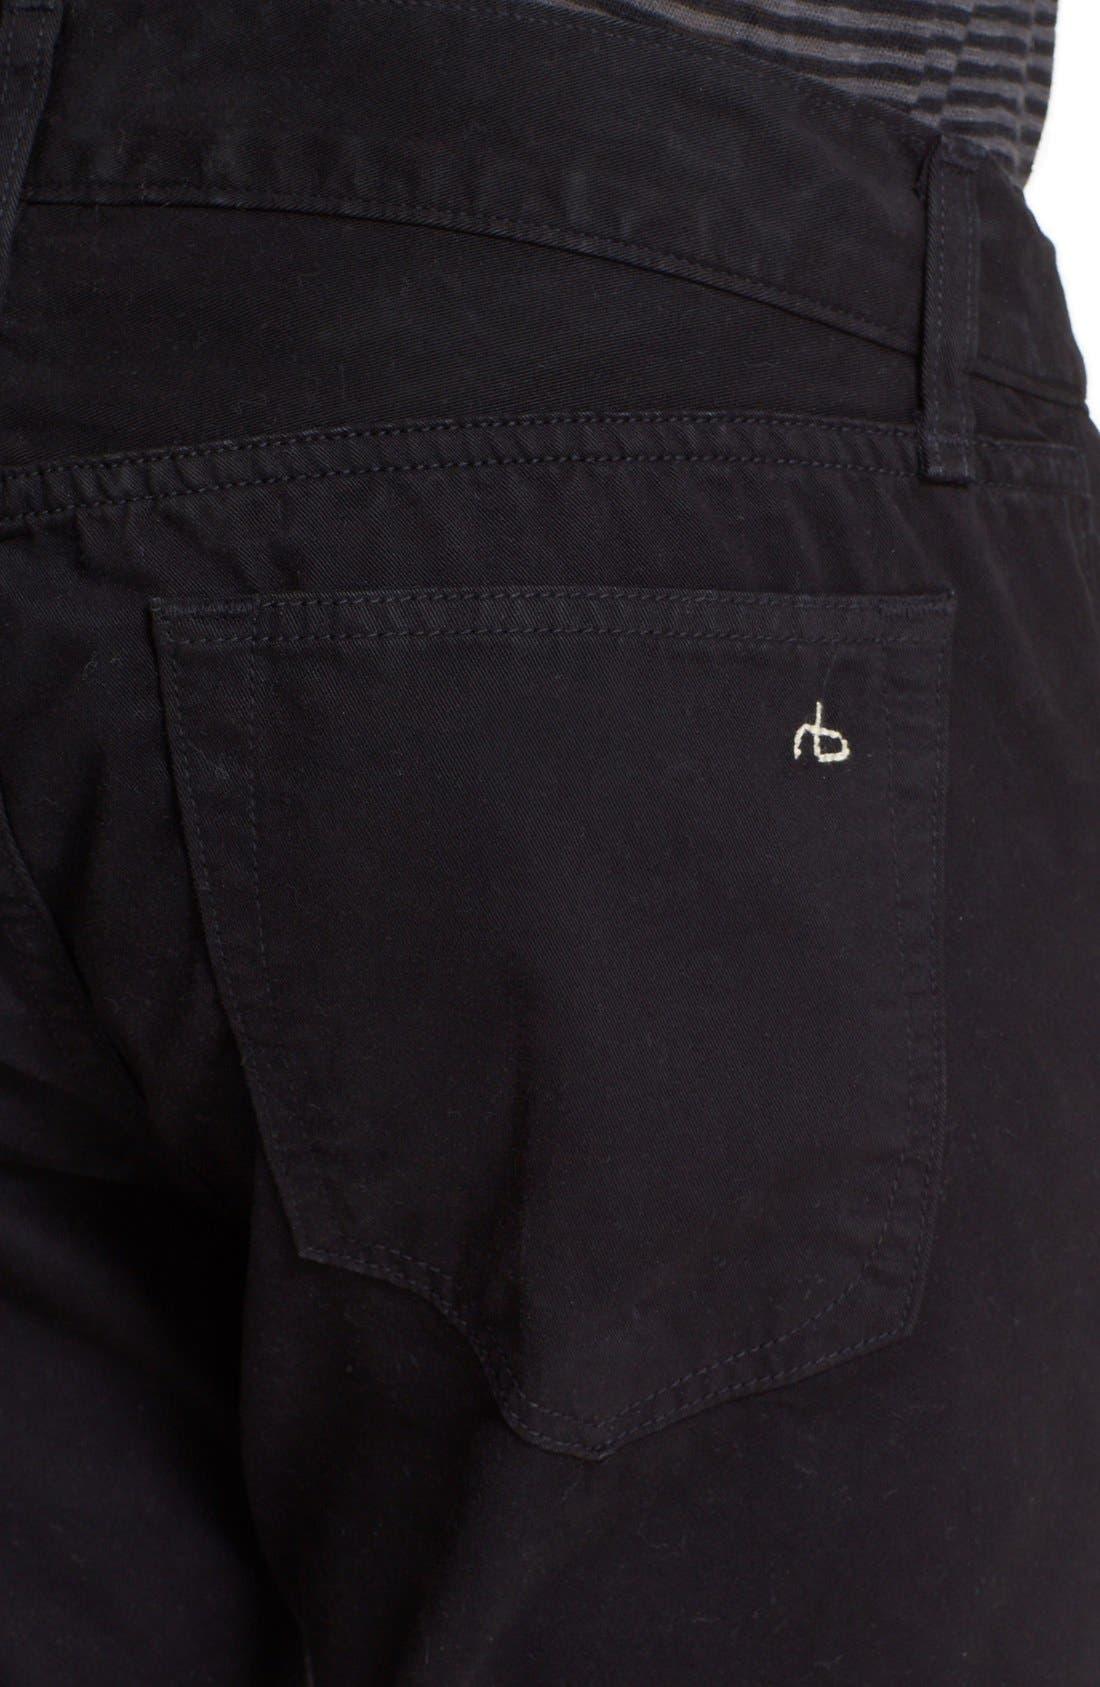 'Fit 2' Cotton Twill Pants,                             Alternate thumbnail 4, color,                             001